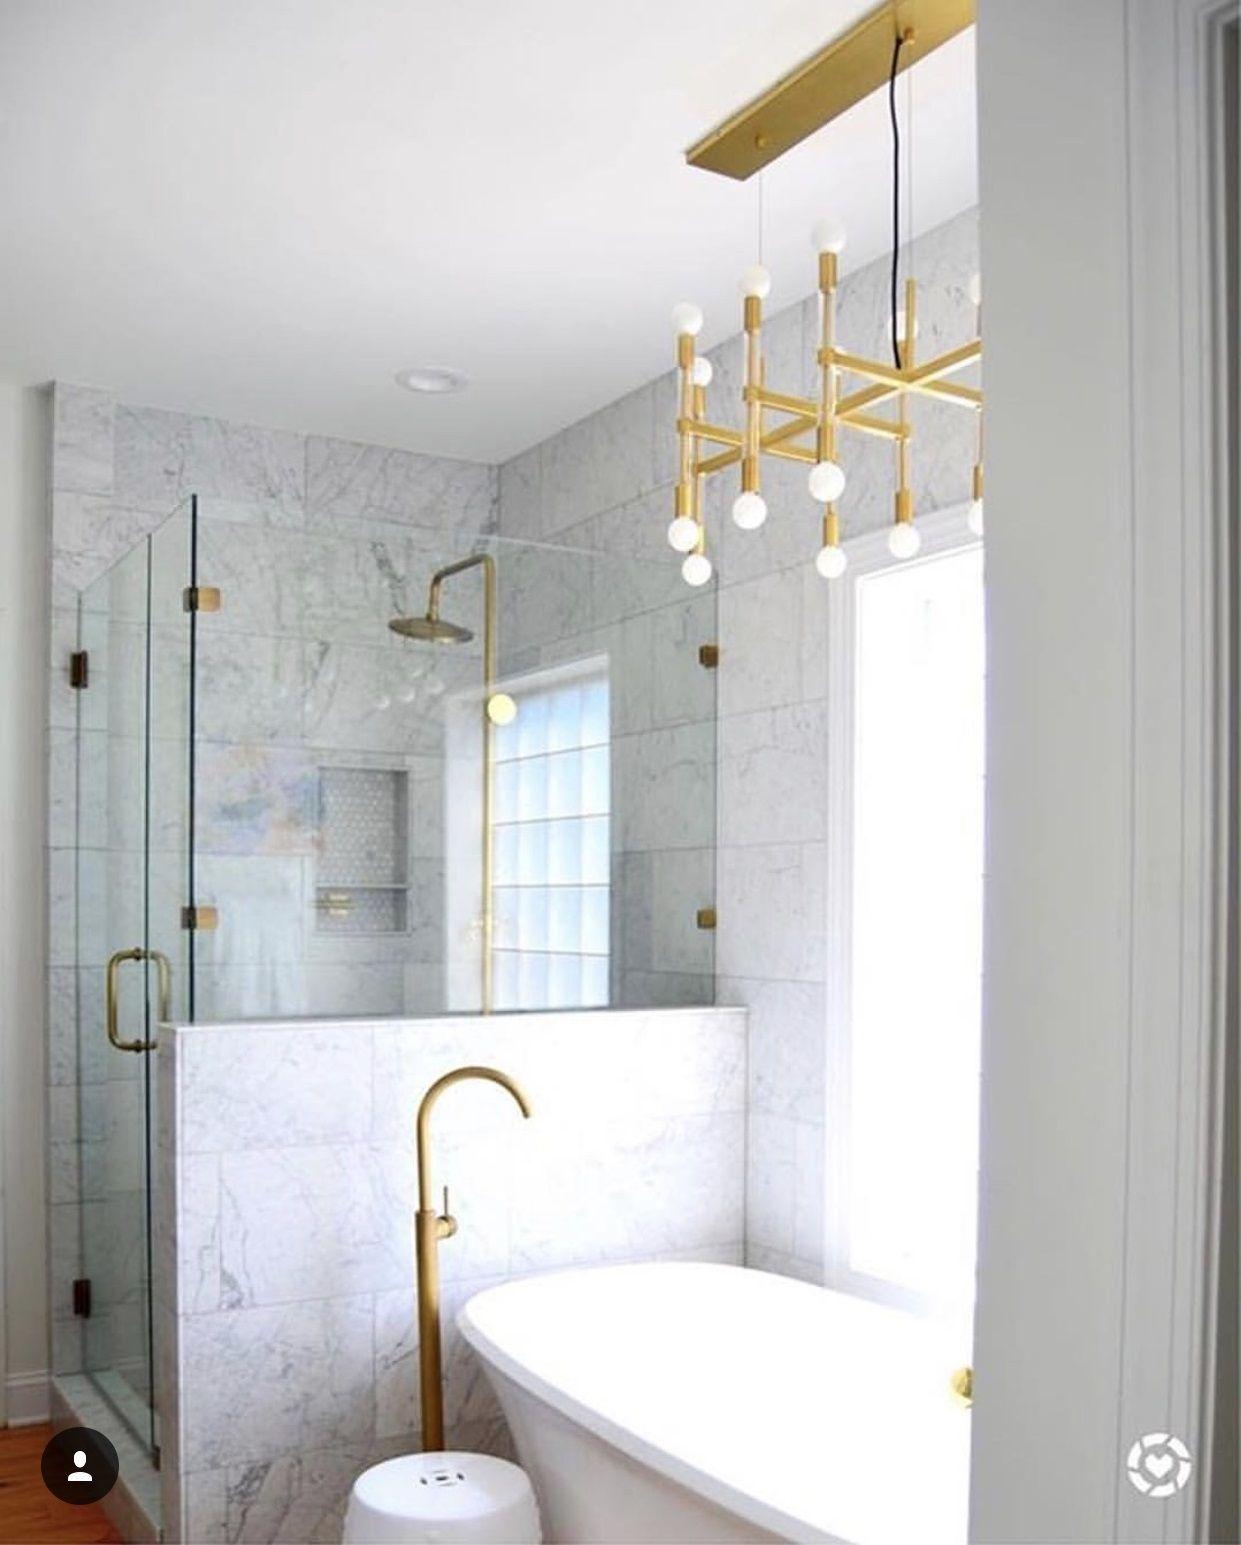 Bathroom interior hd marble bathroom with brass accessories ig liketoknowhome